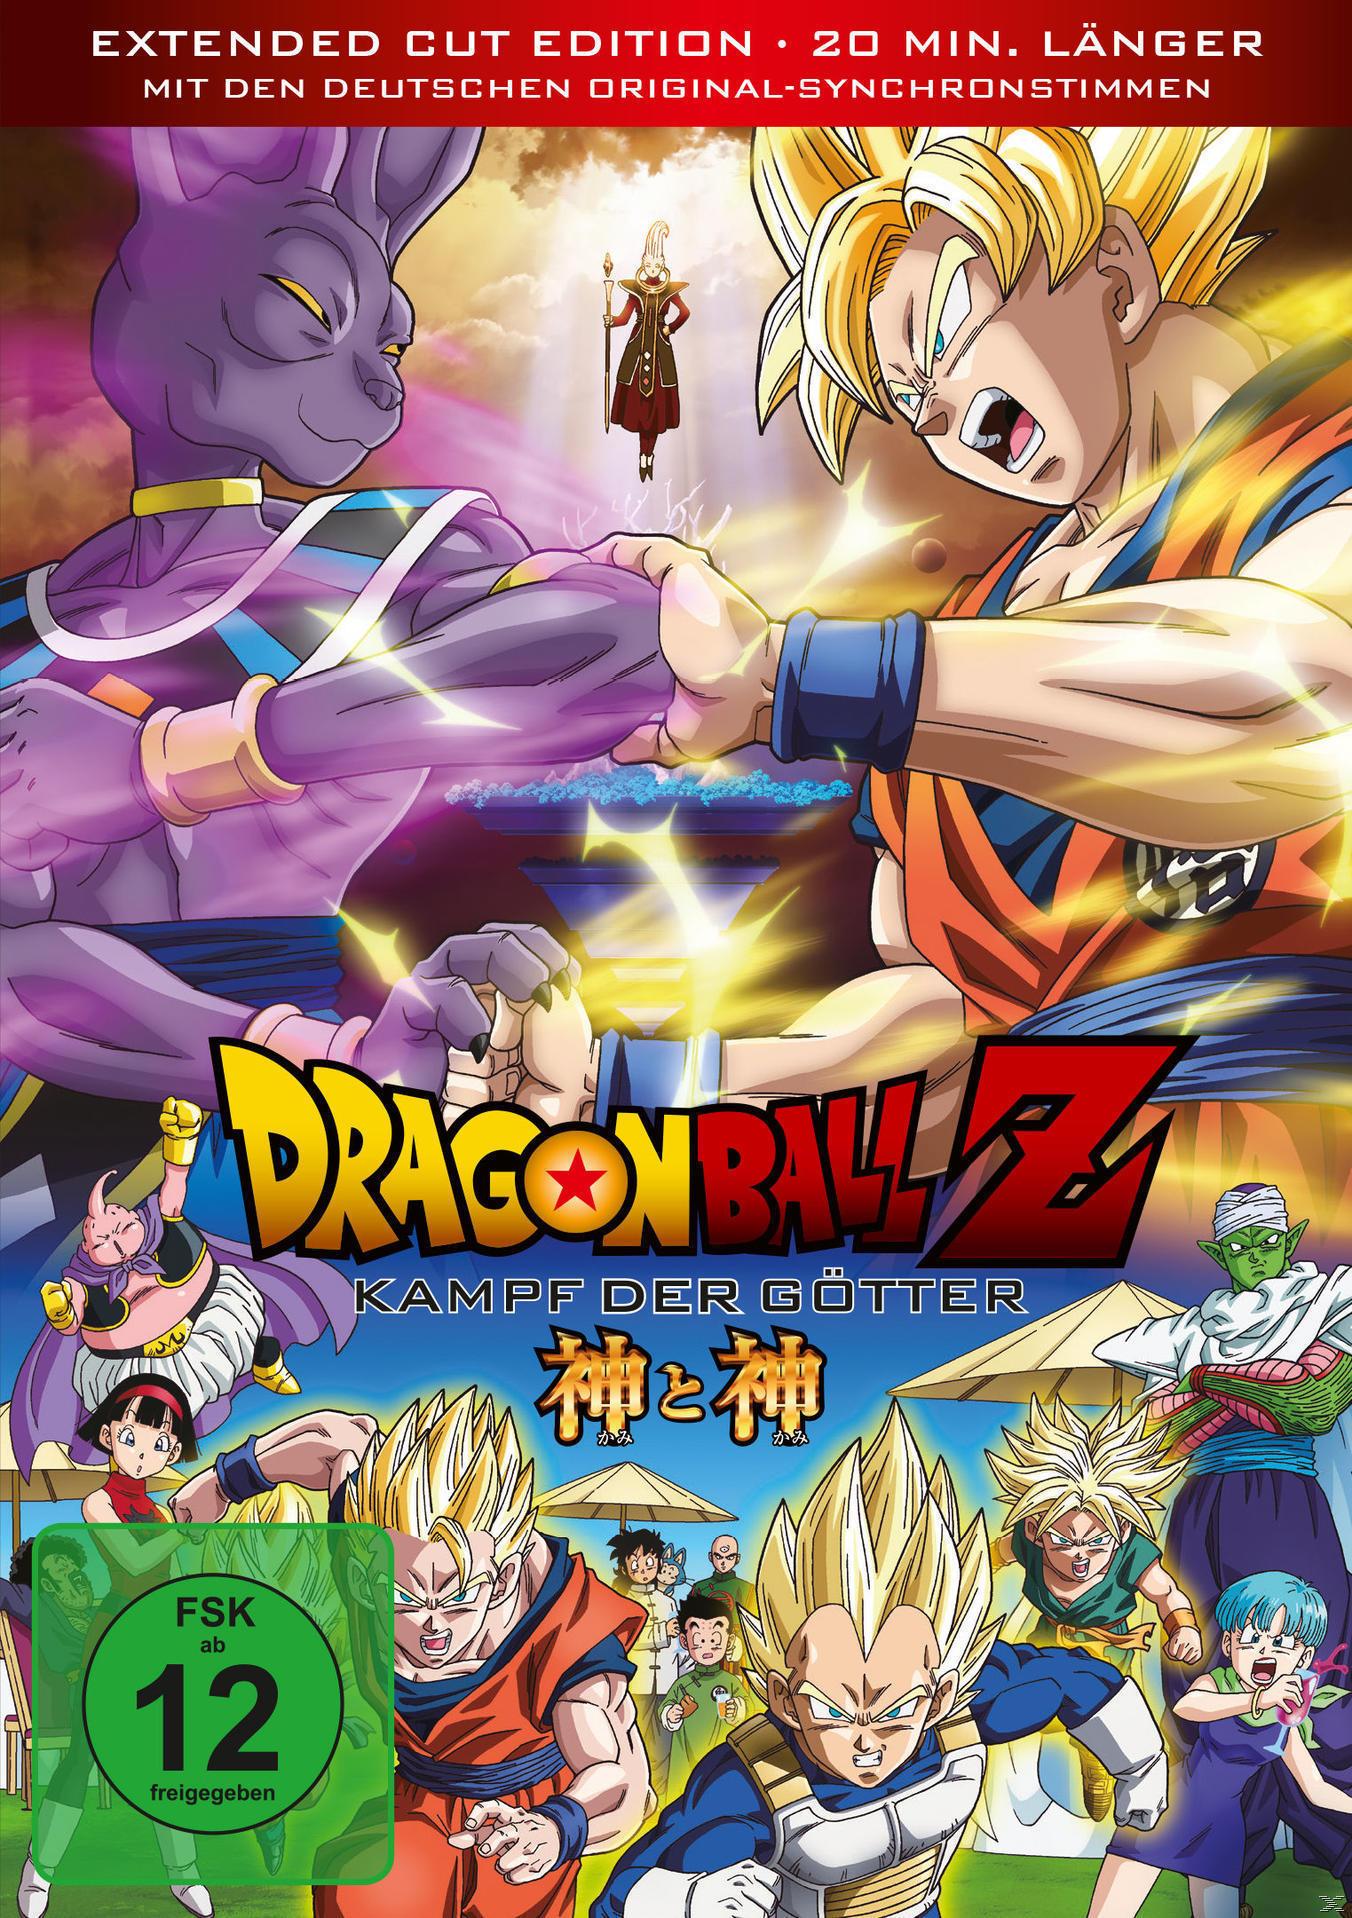 Dragonball Z - Kampf der Götter Extended Edition (DVD) für 19,99 Euro